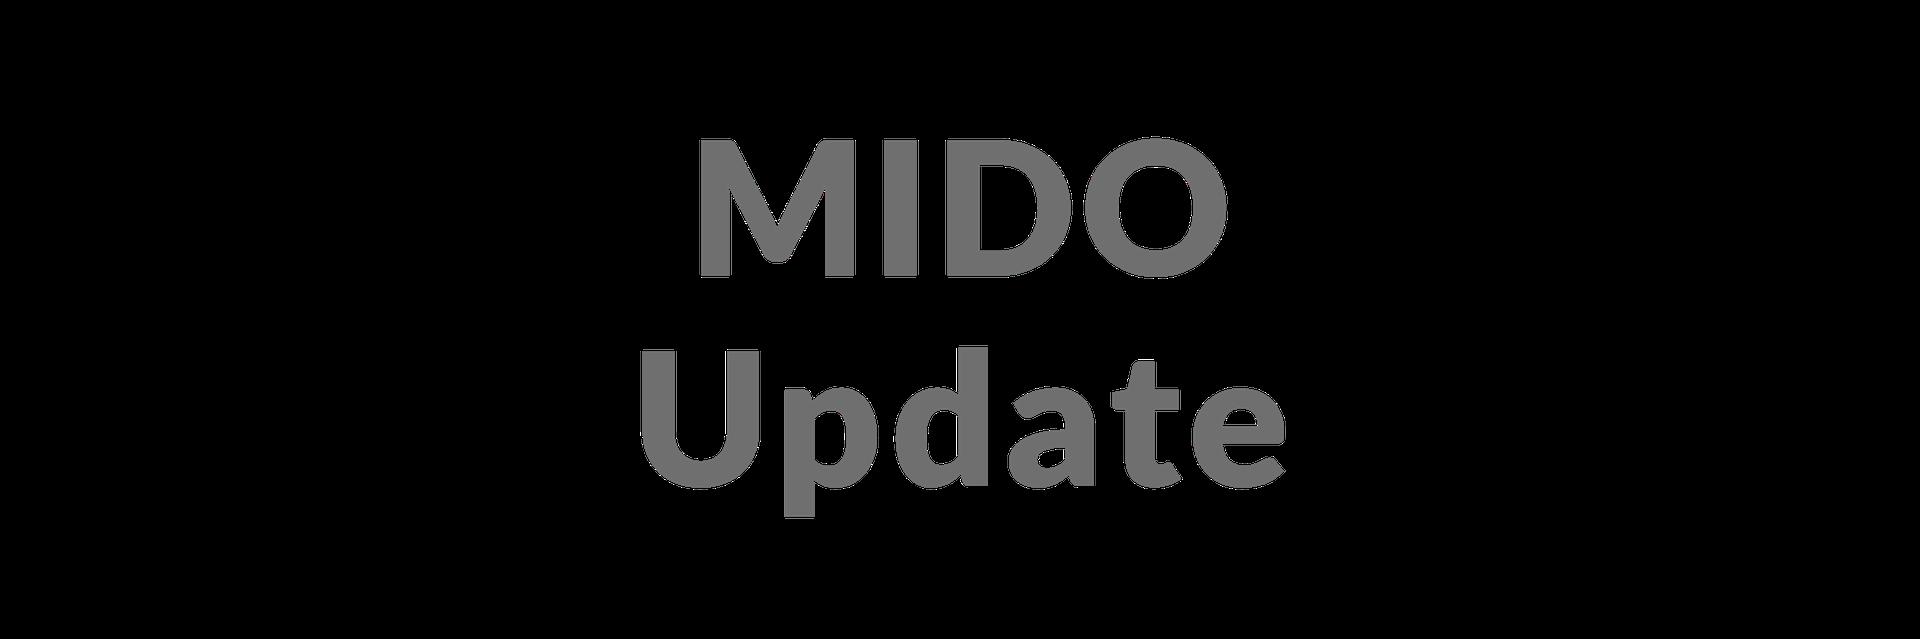 MIDO update